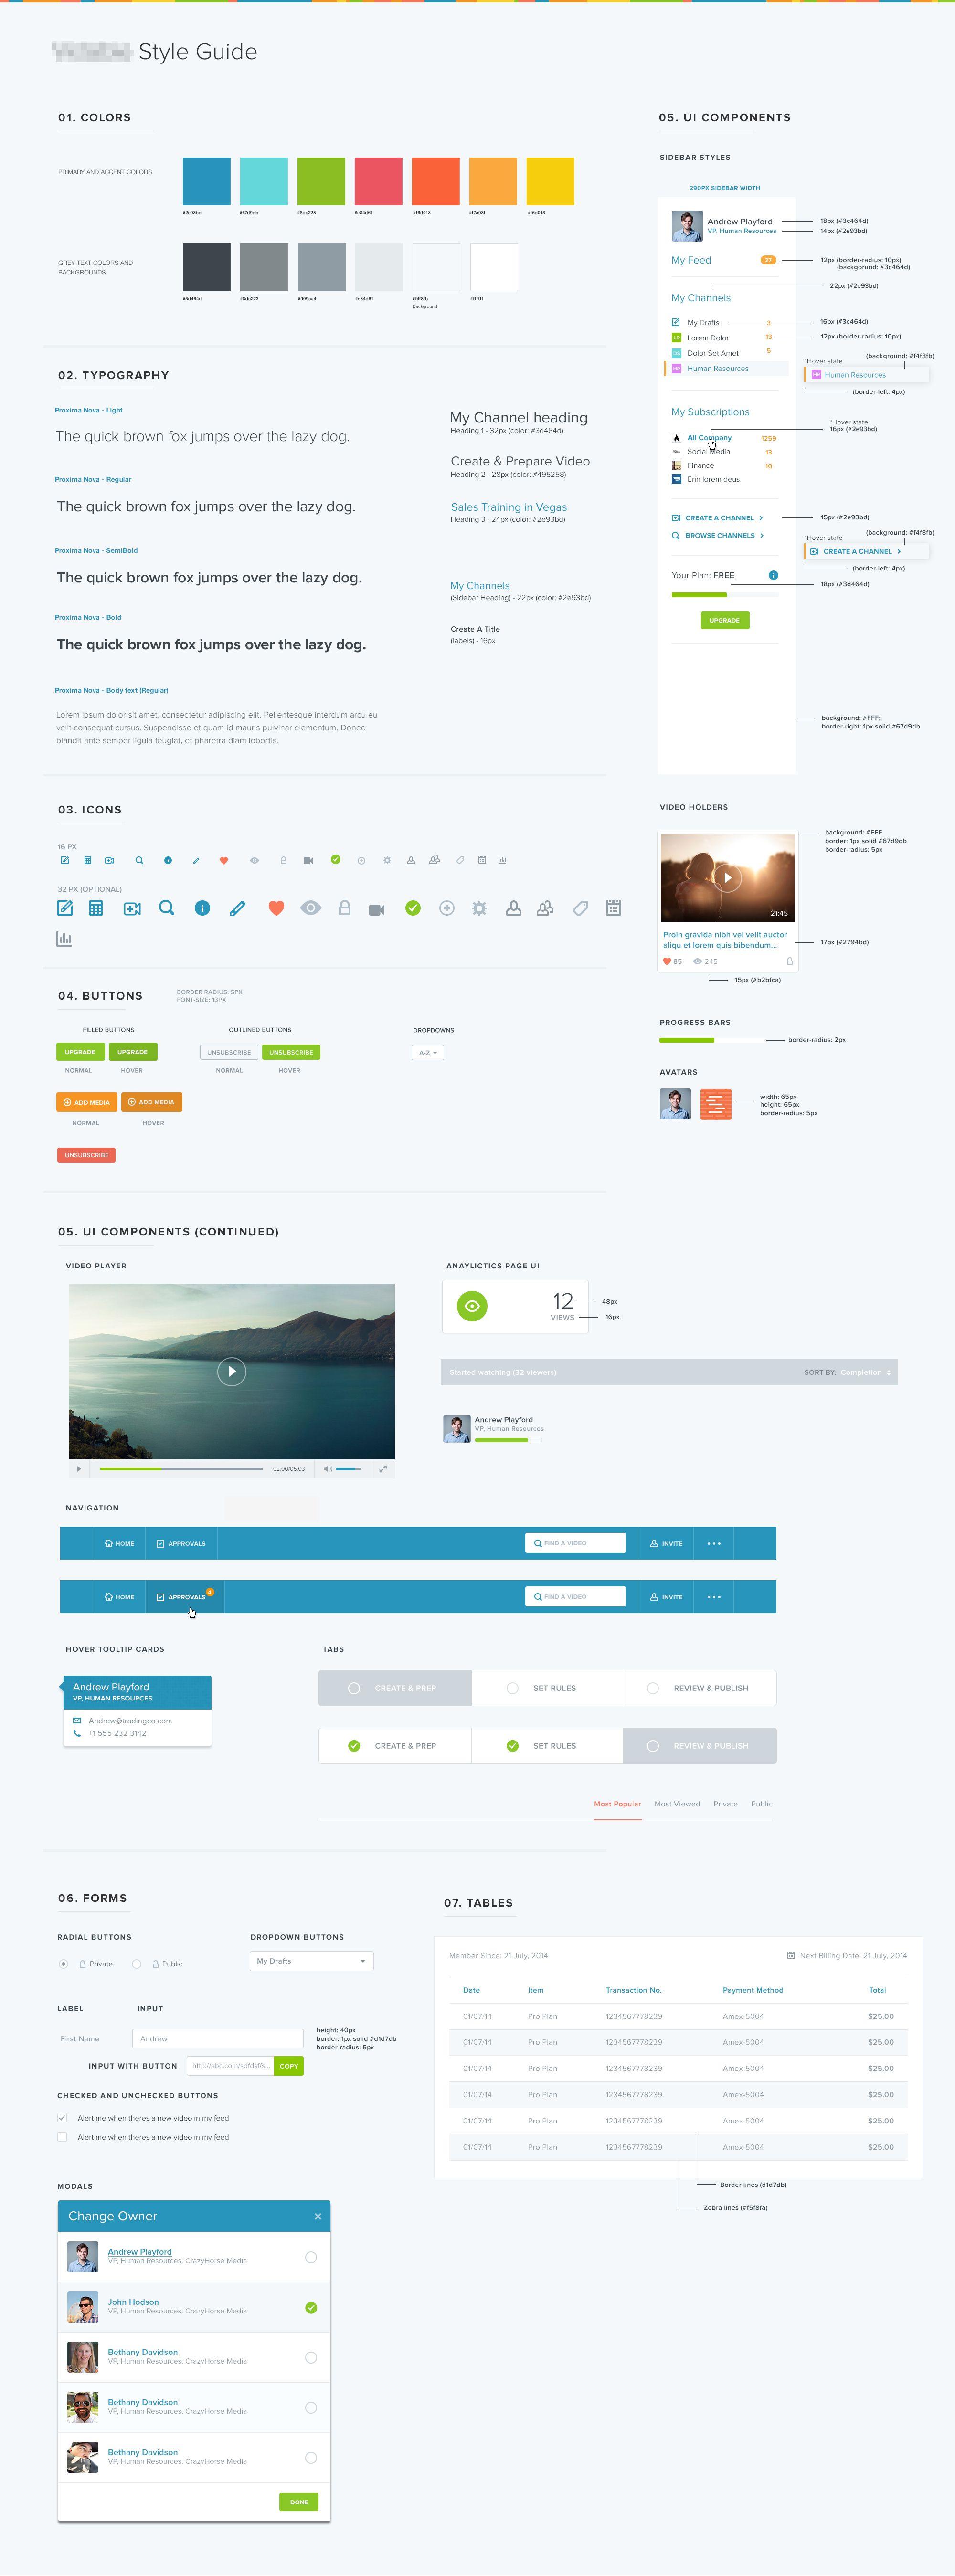 Style Guide App 1a 웹 스타일 가이드 웹디자인 앱